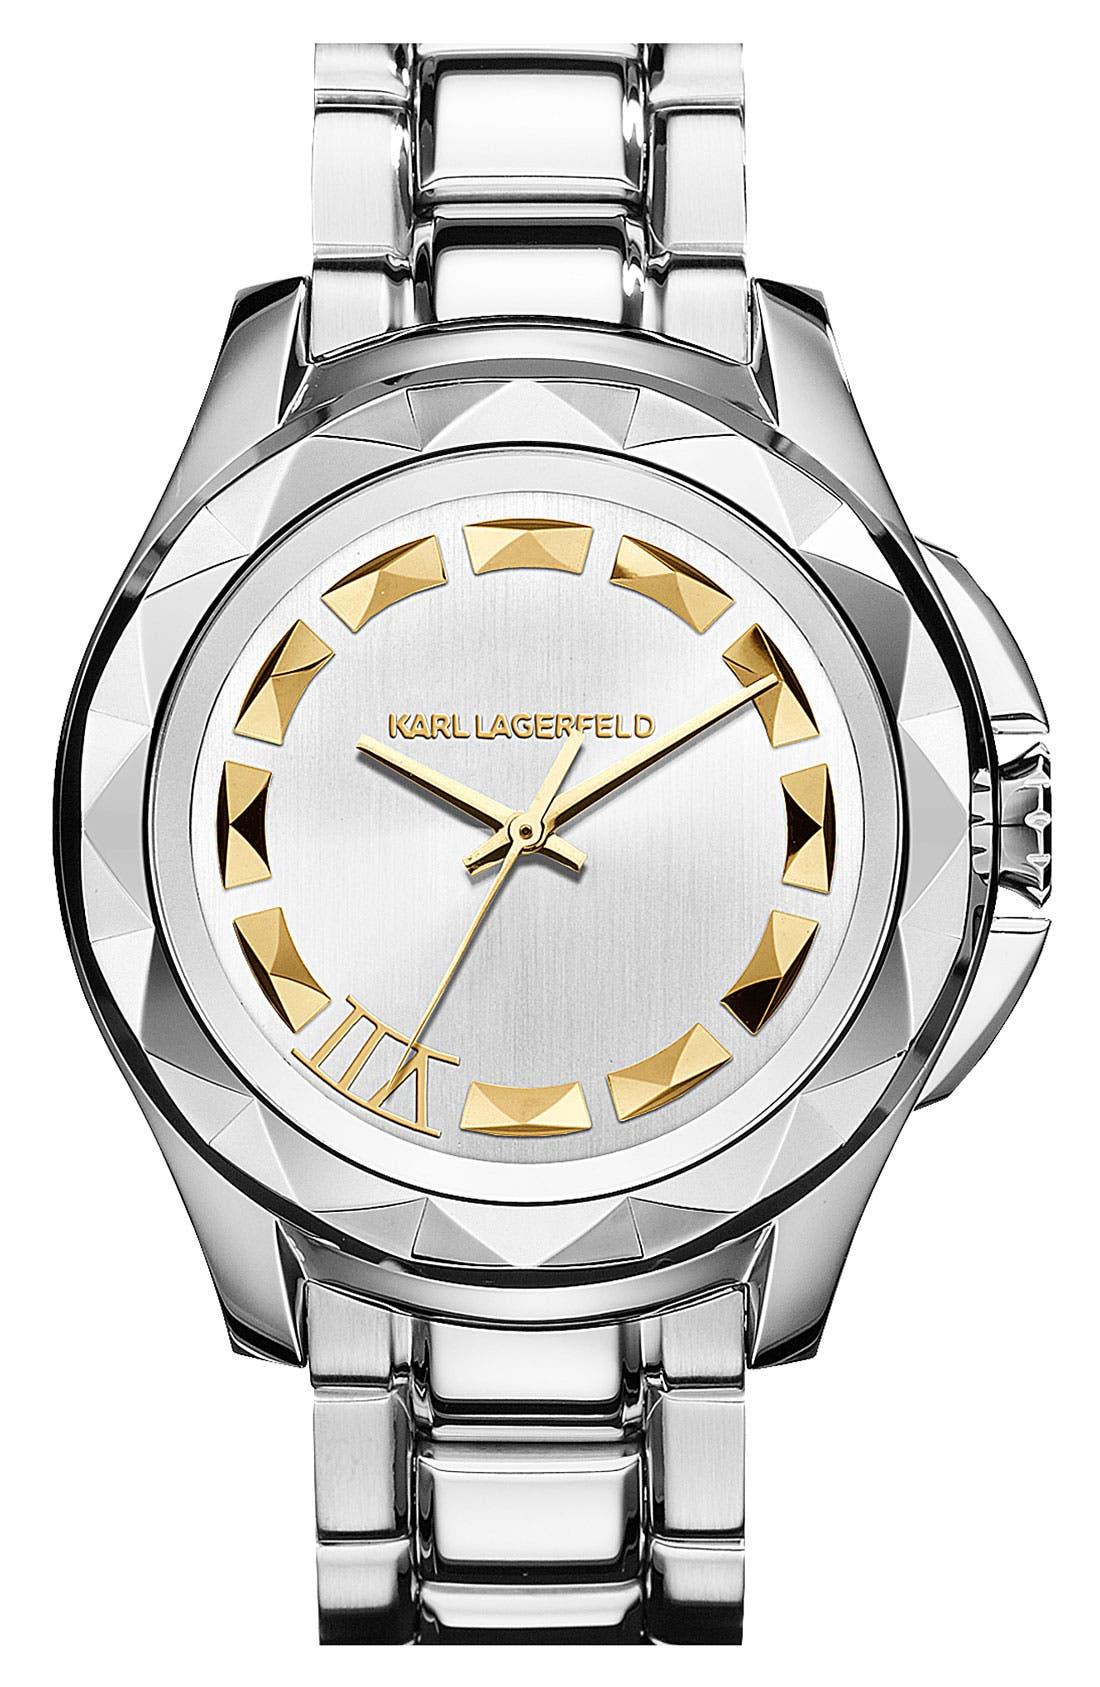 Alternate Image 1 Selected - KARL LAGERFELD '7' Faceted Bezel Bracelet Watch, 44mm x 53mm